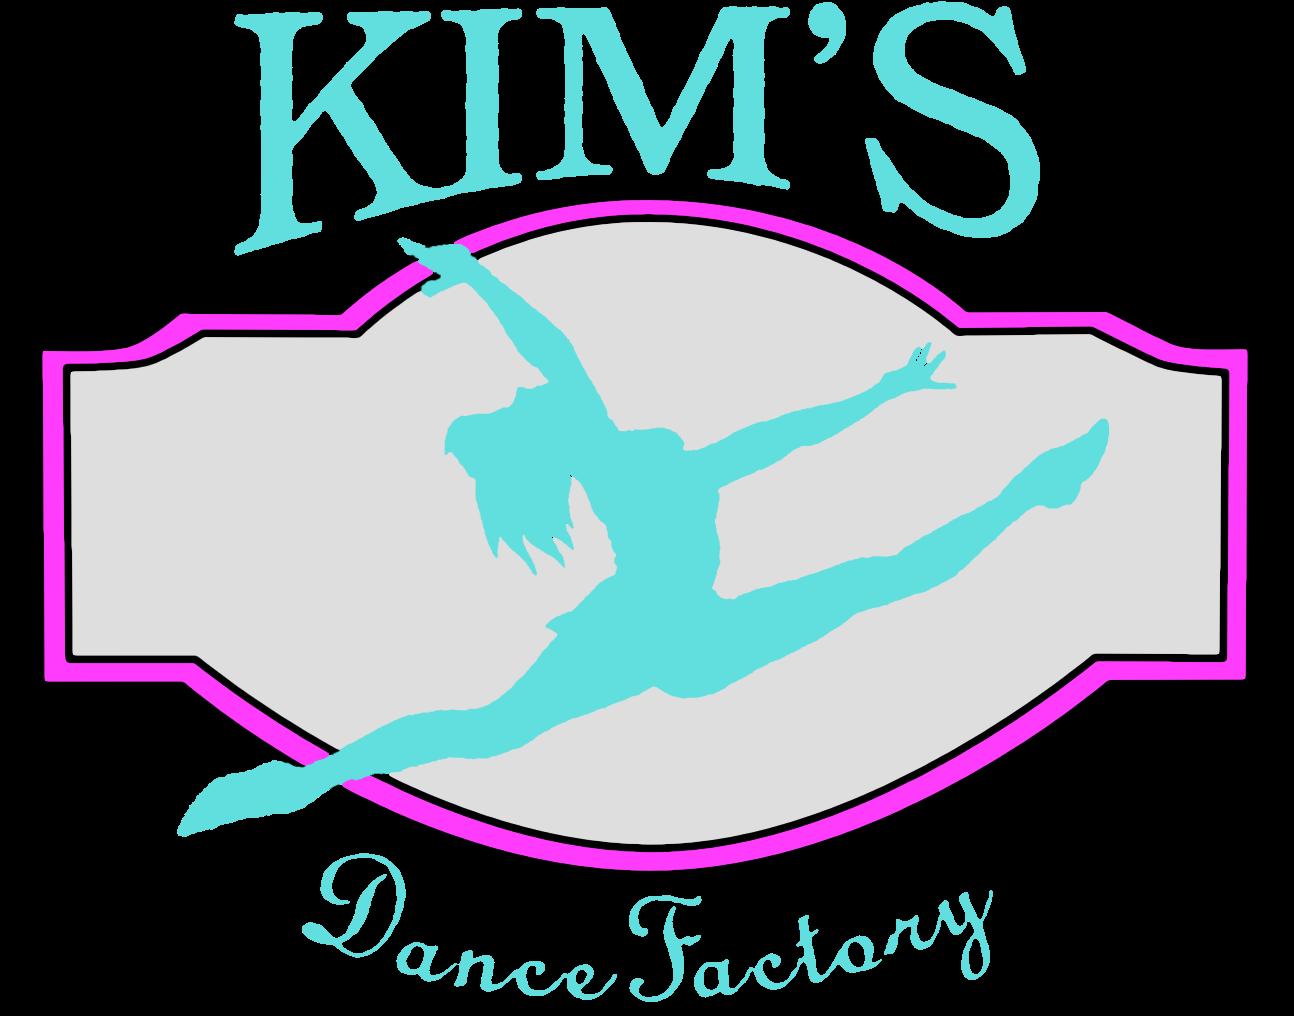 Kim's Dance Factory